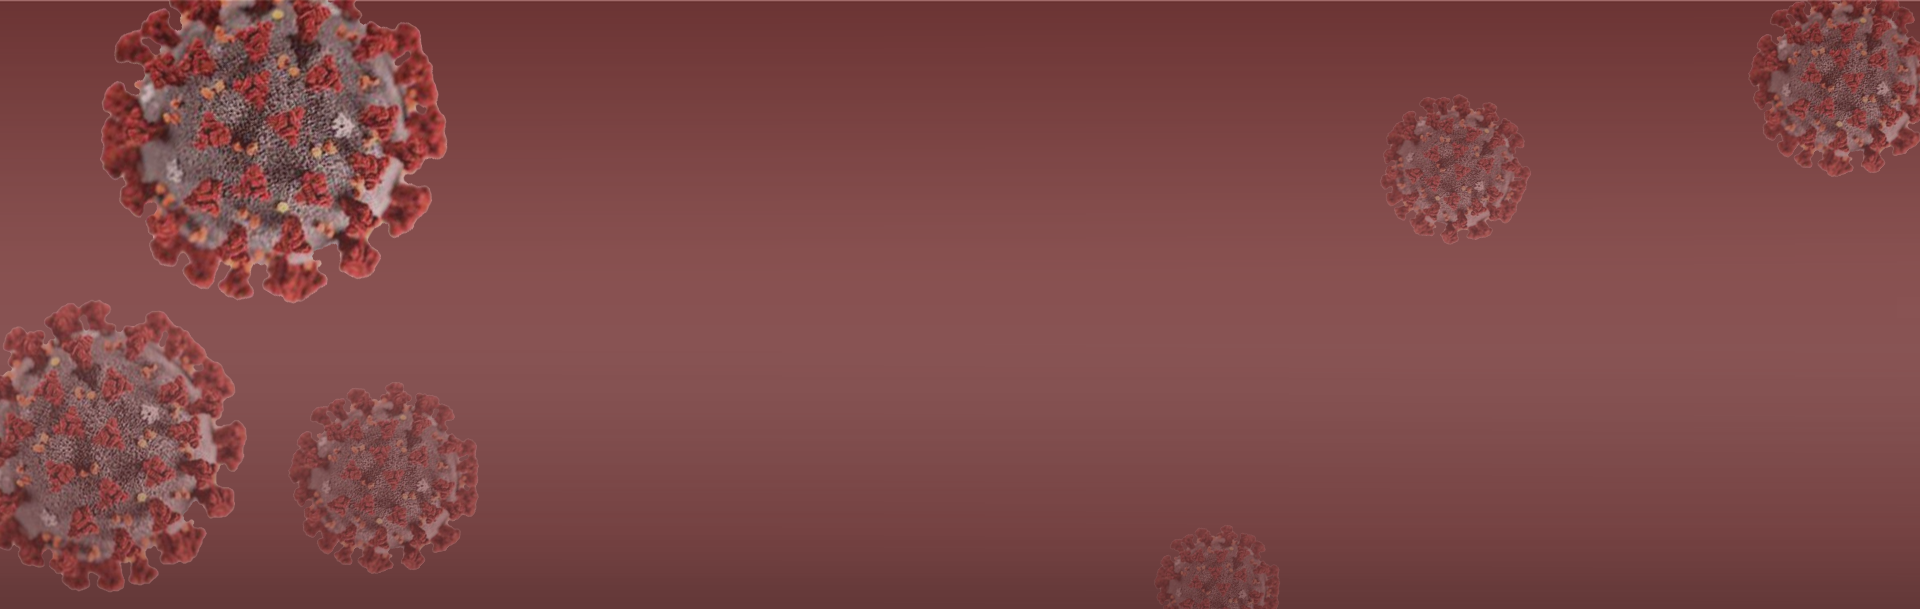 covid-banner-bg